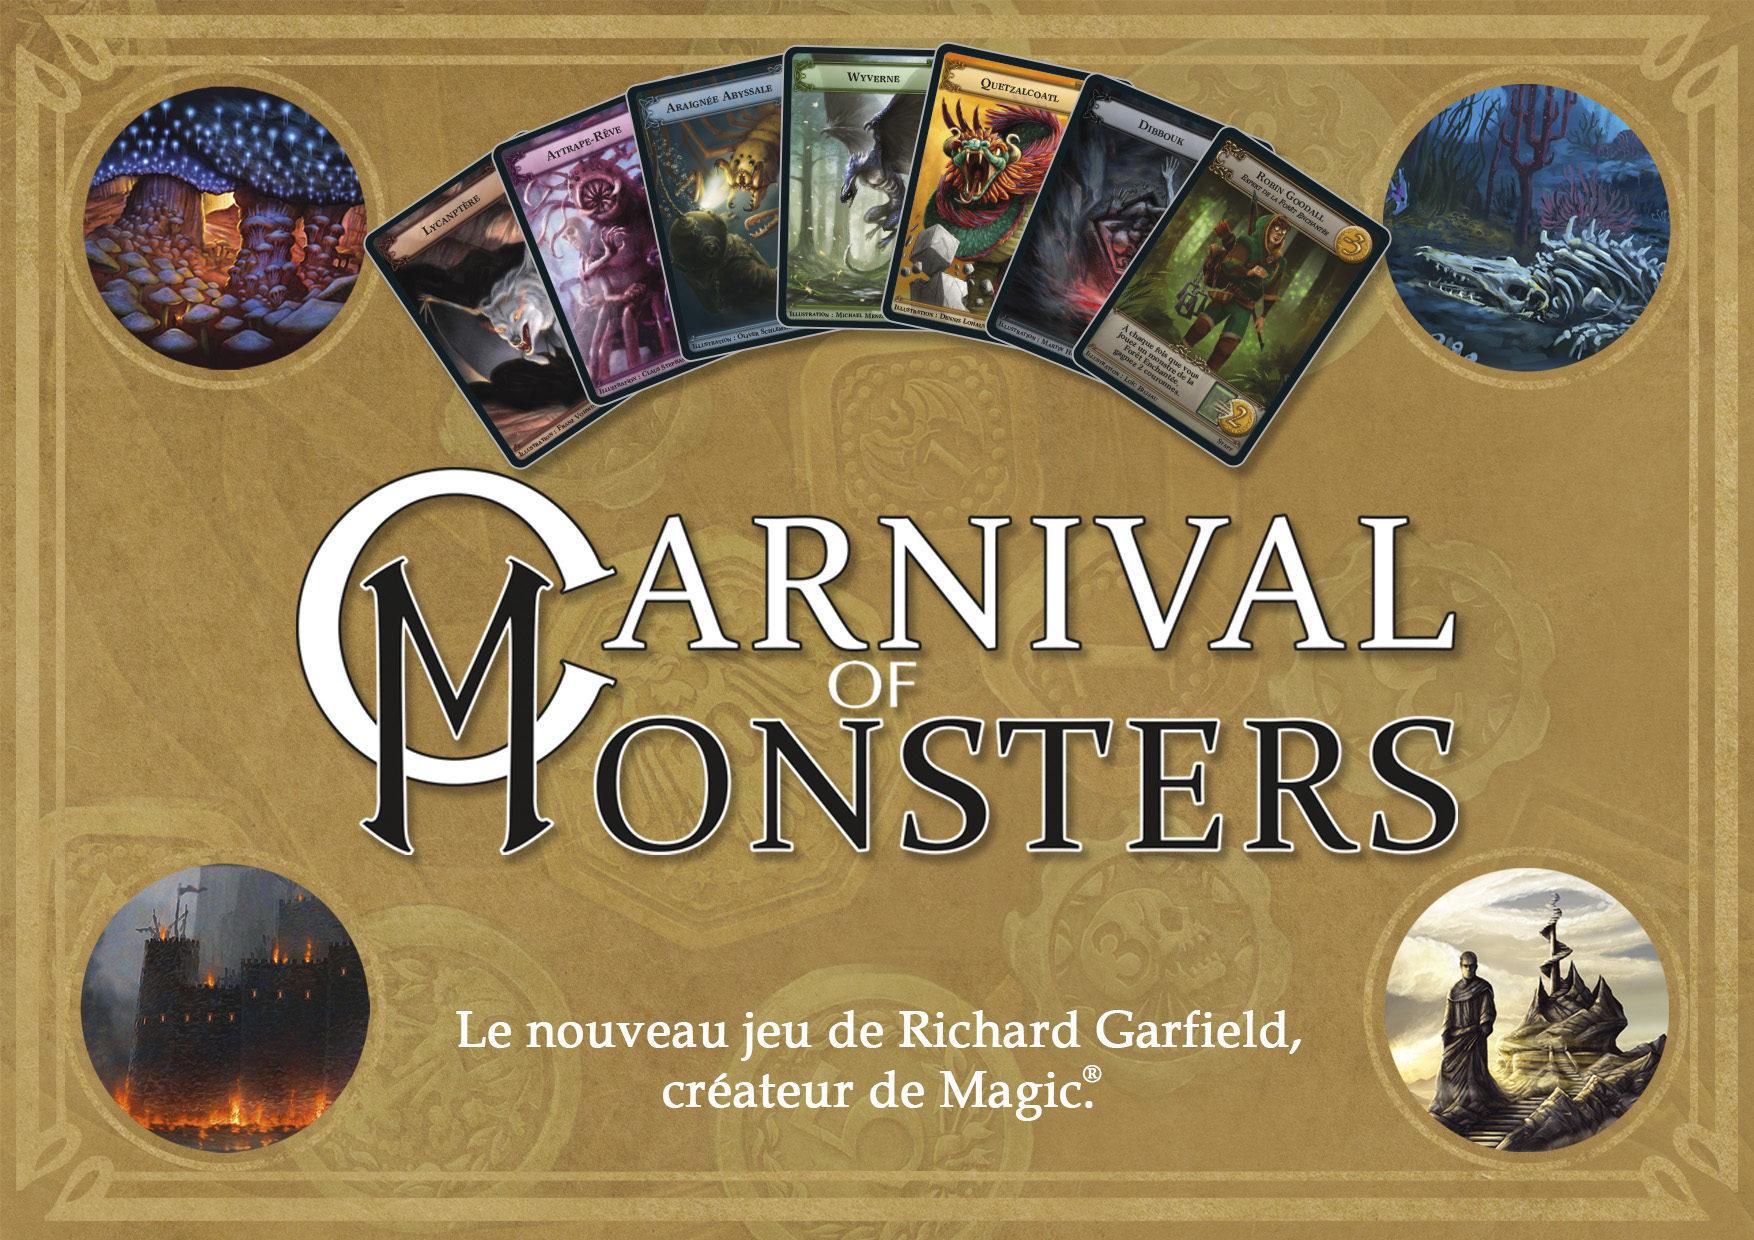 Carnival Of Monsters ou le jeu de draft selon Richard Garfield